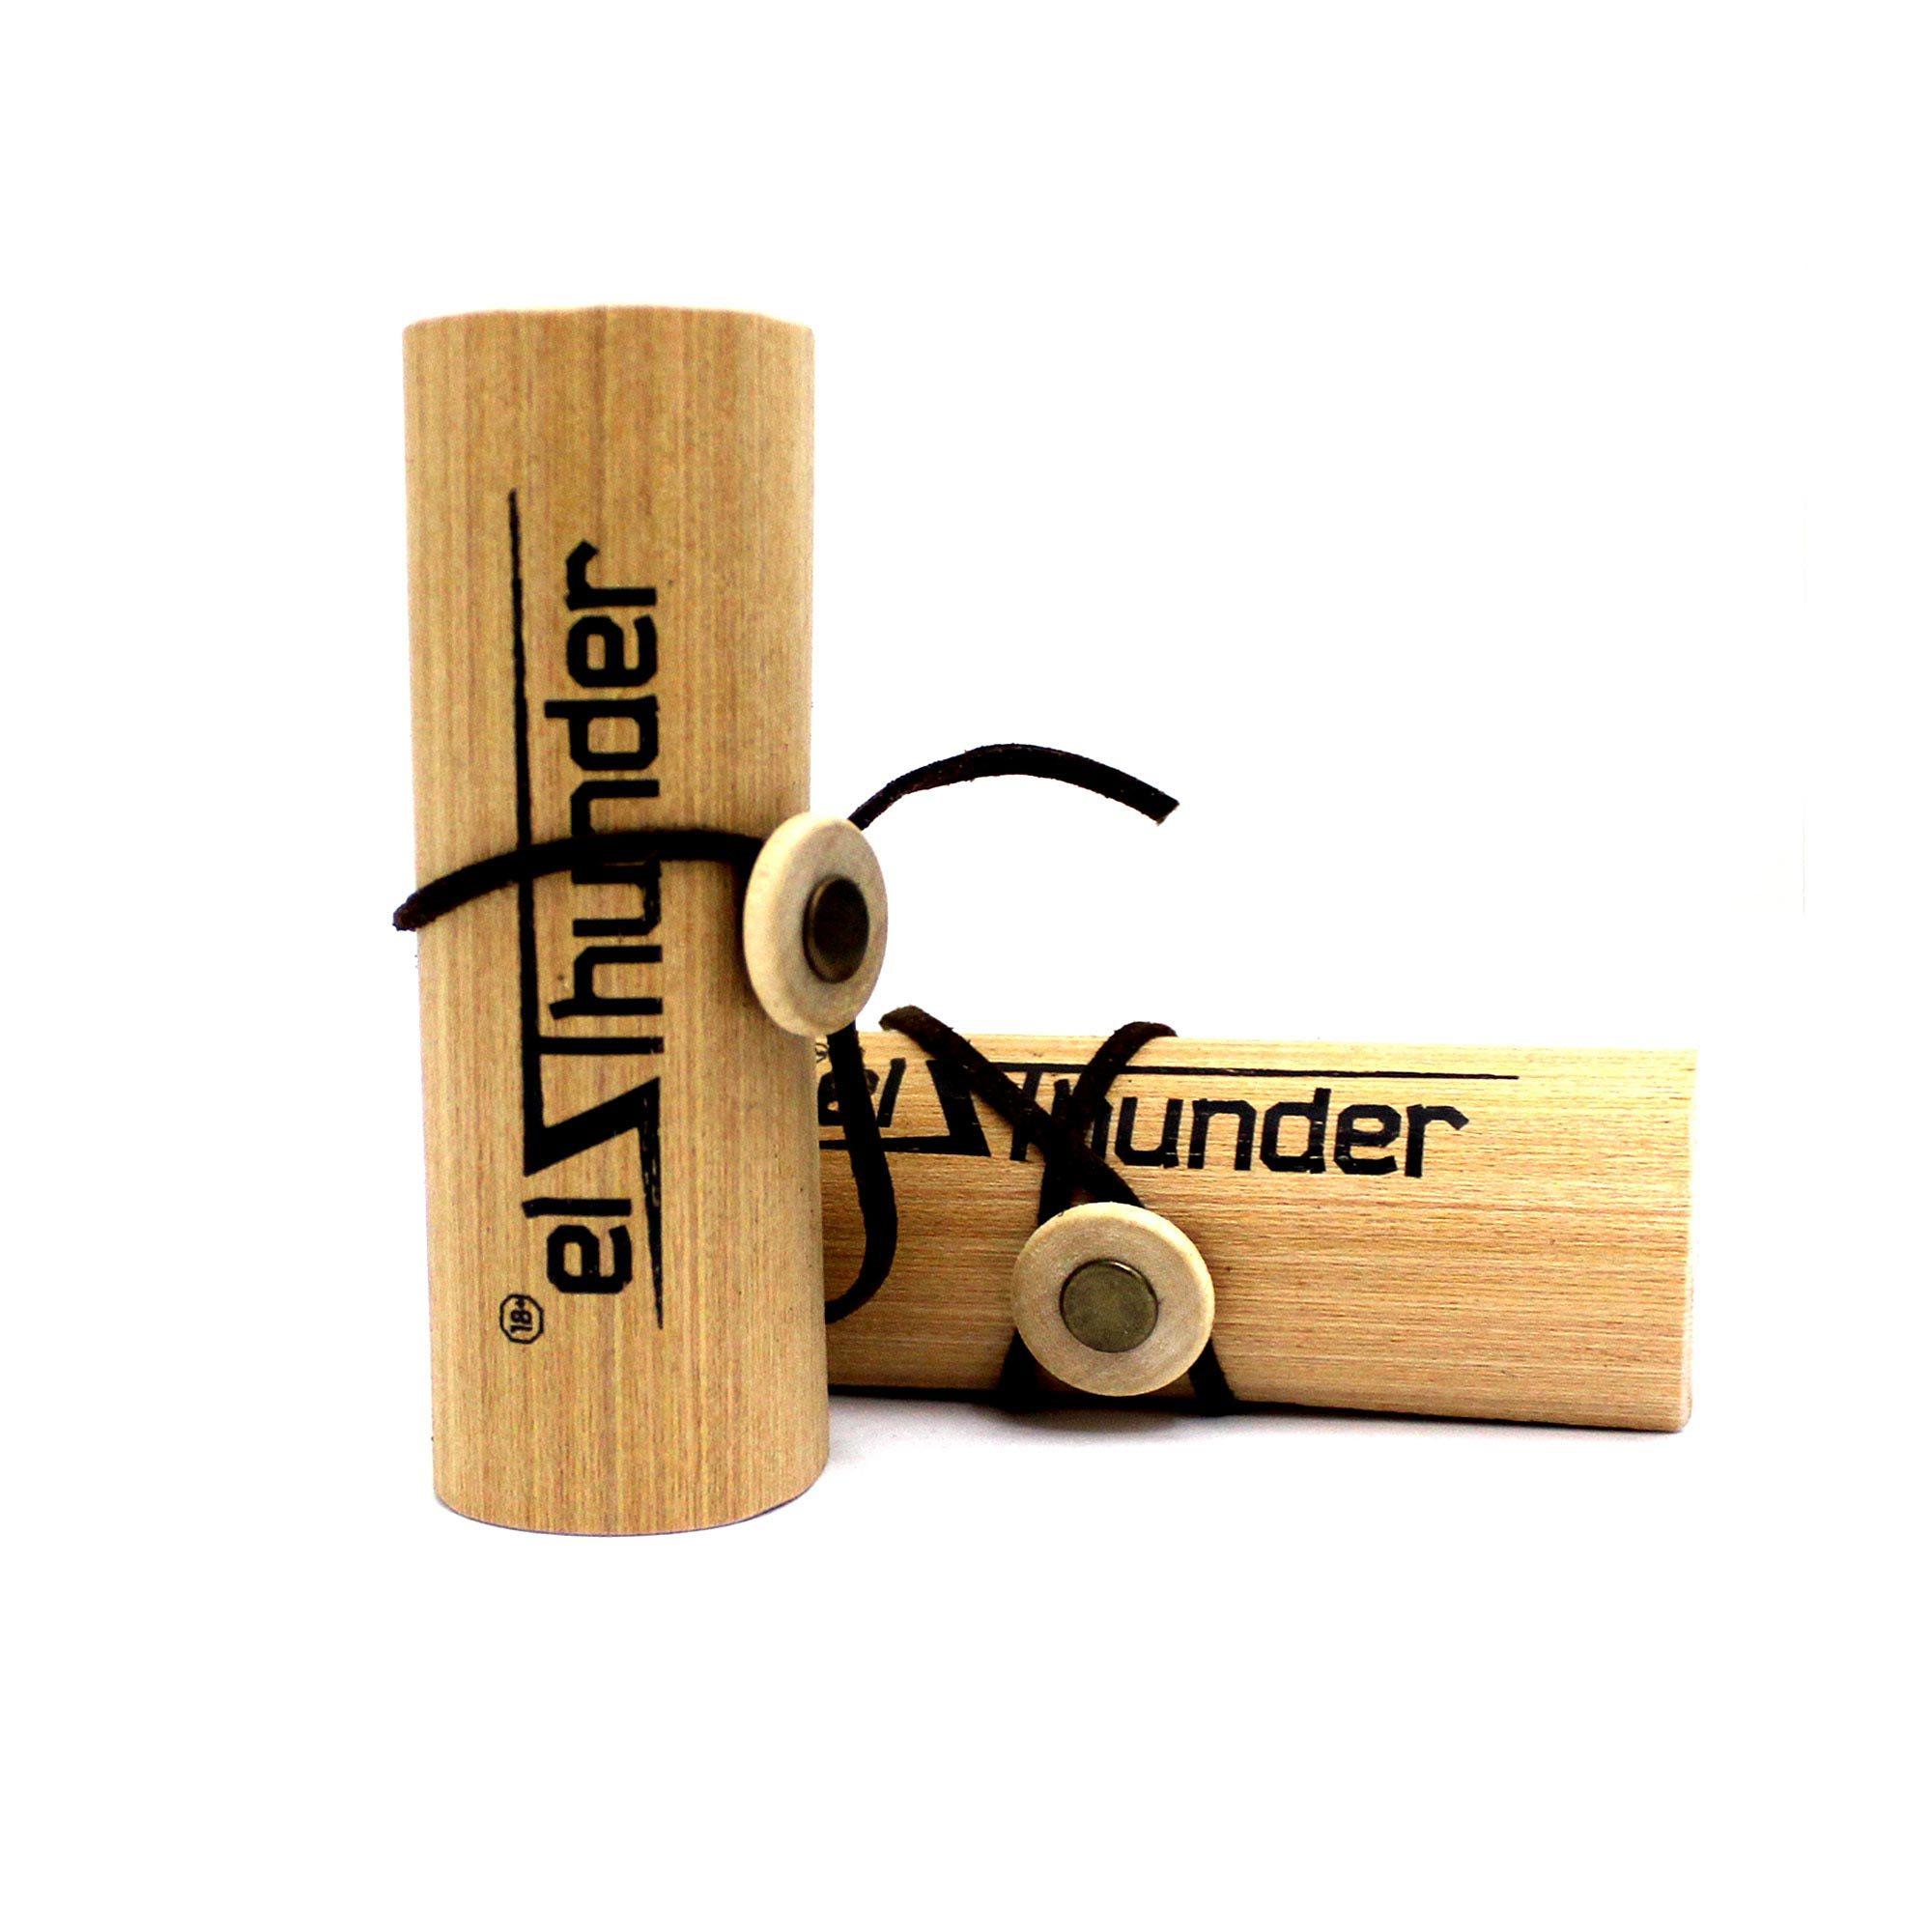 Мехмод El Thunder коробка